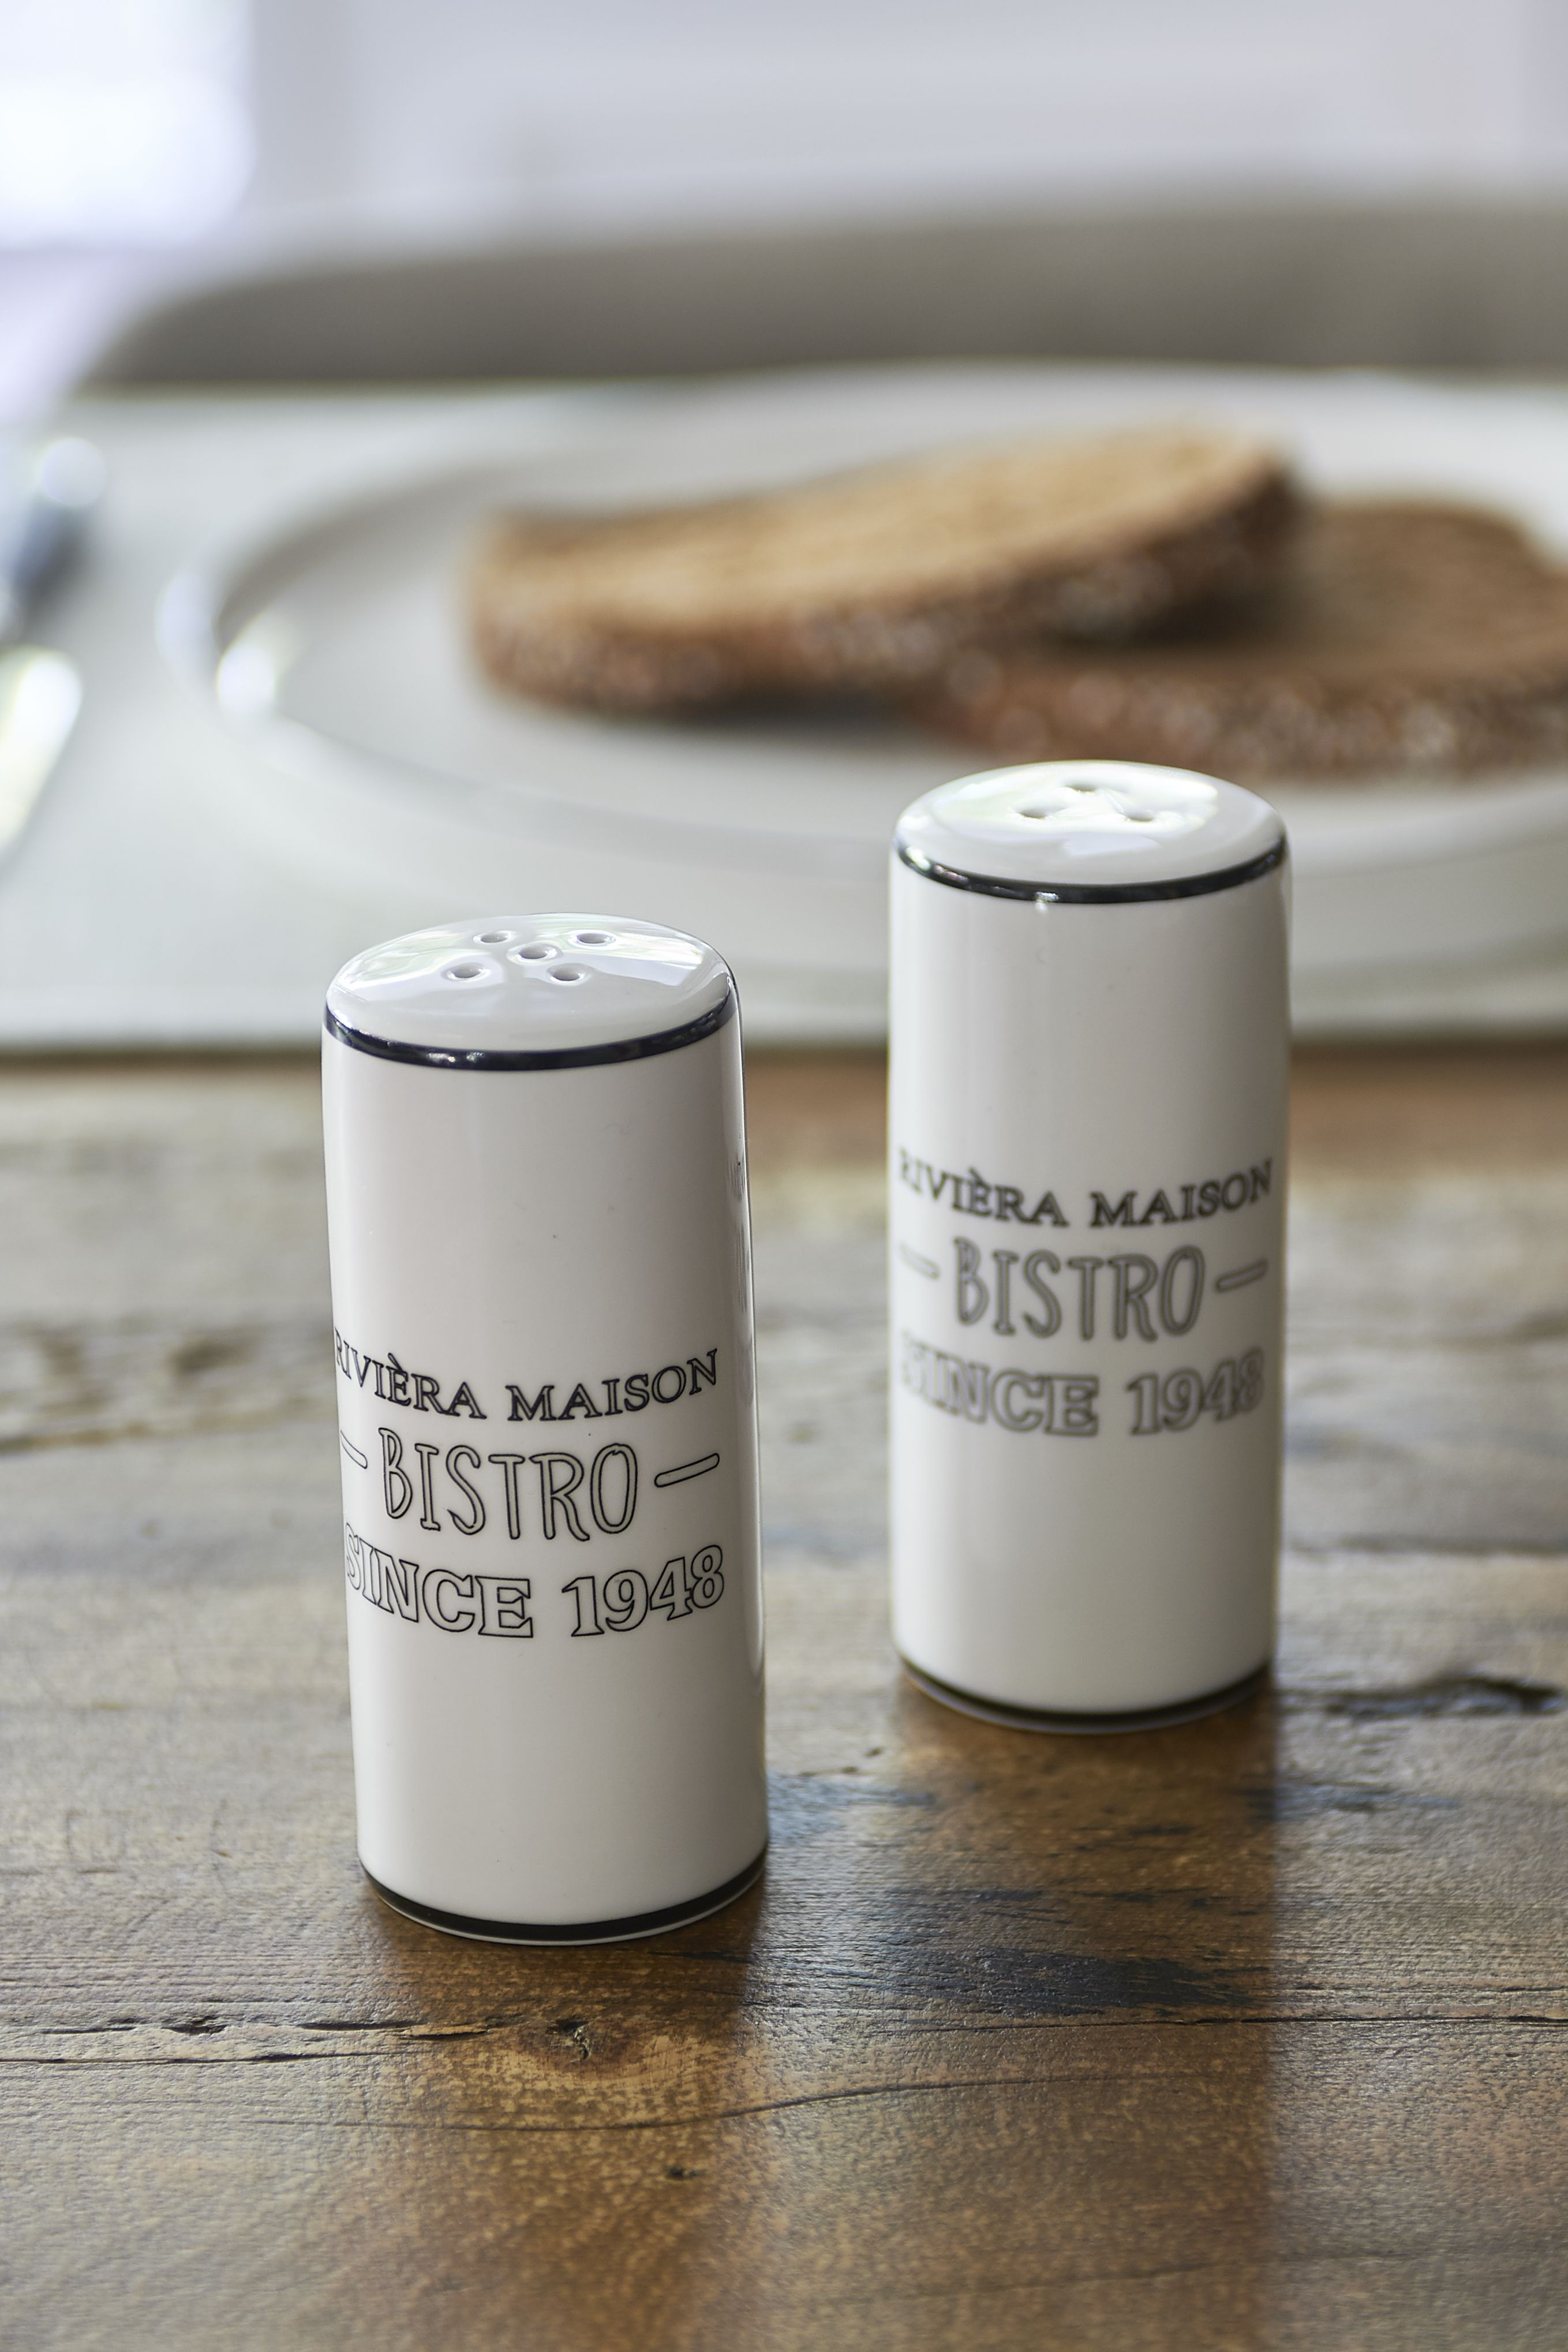 Solnička a korenička RM Bistro Pepper & Salt  set